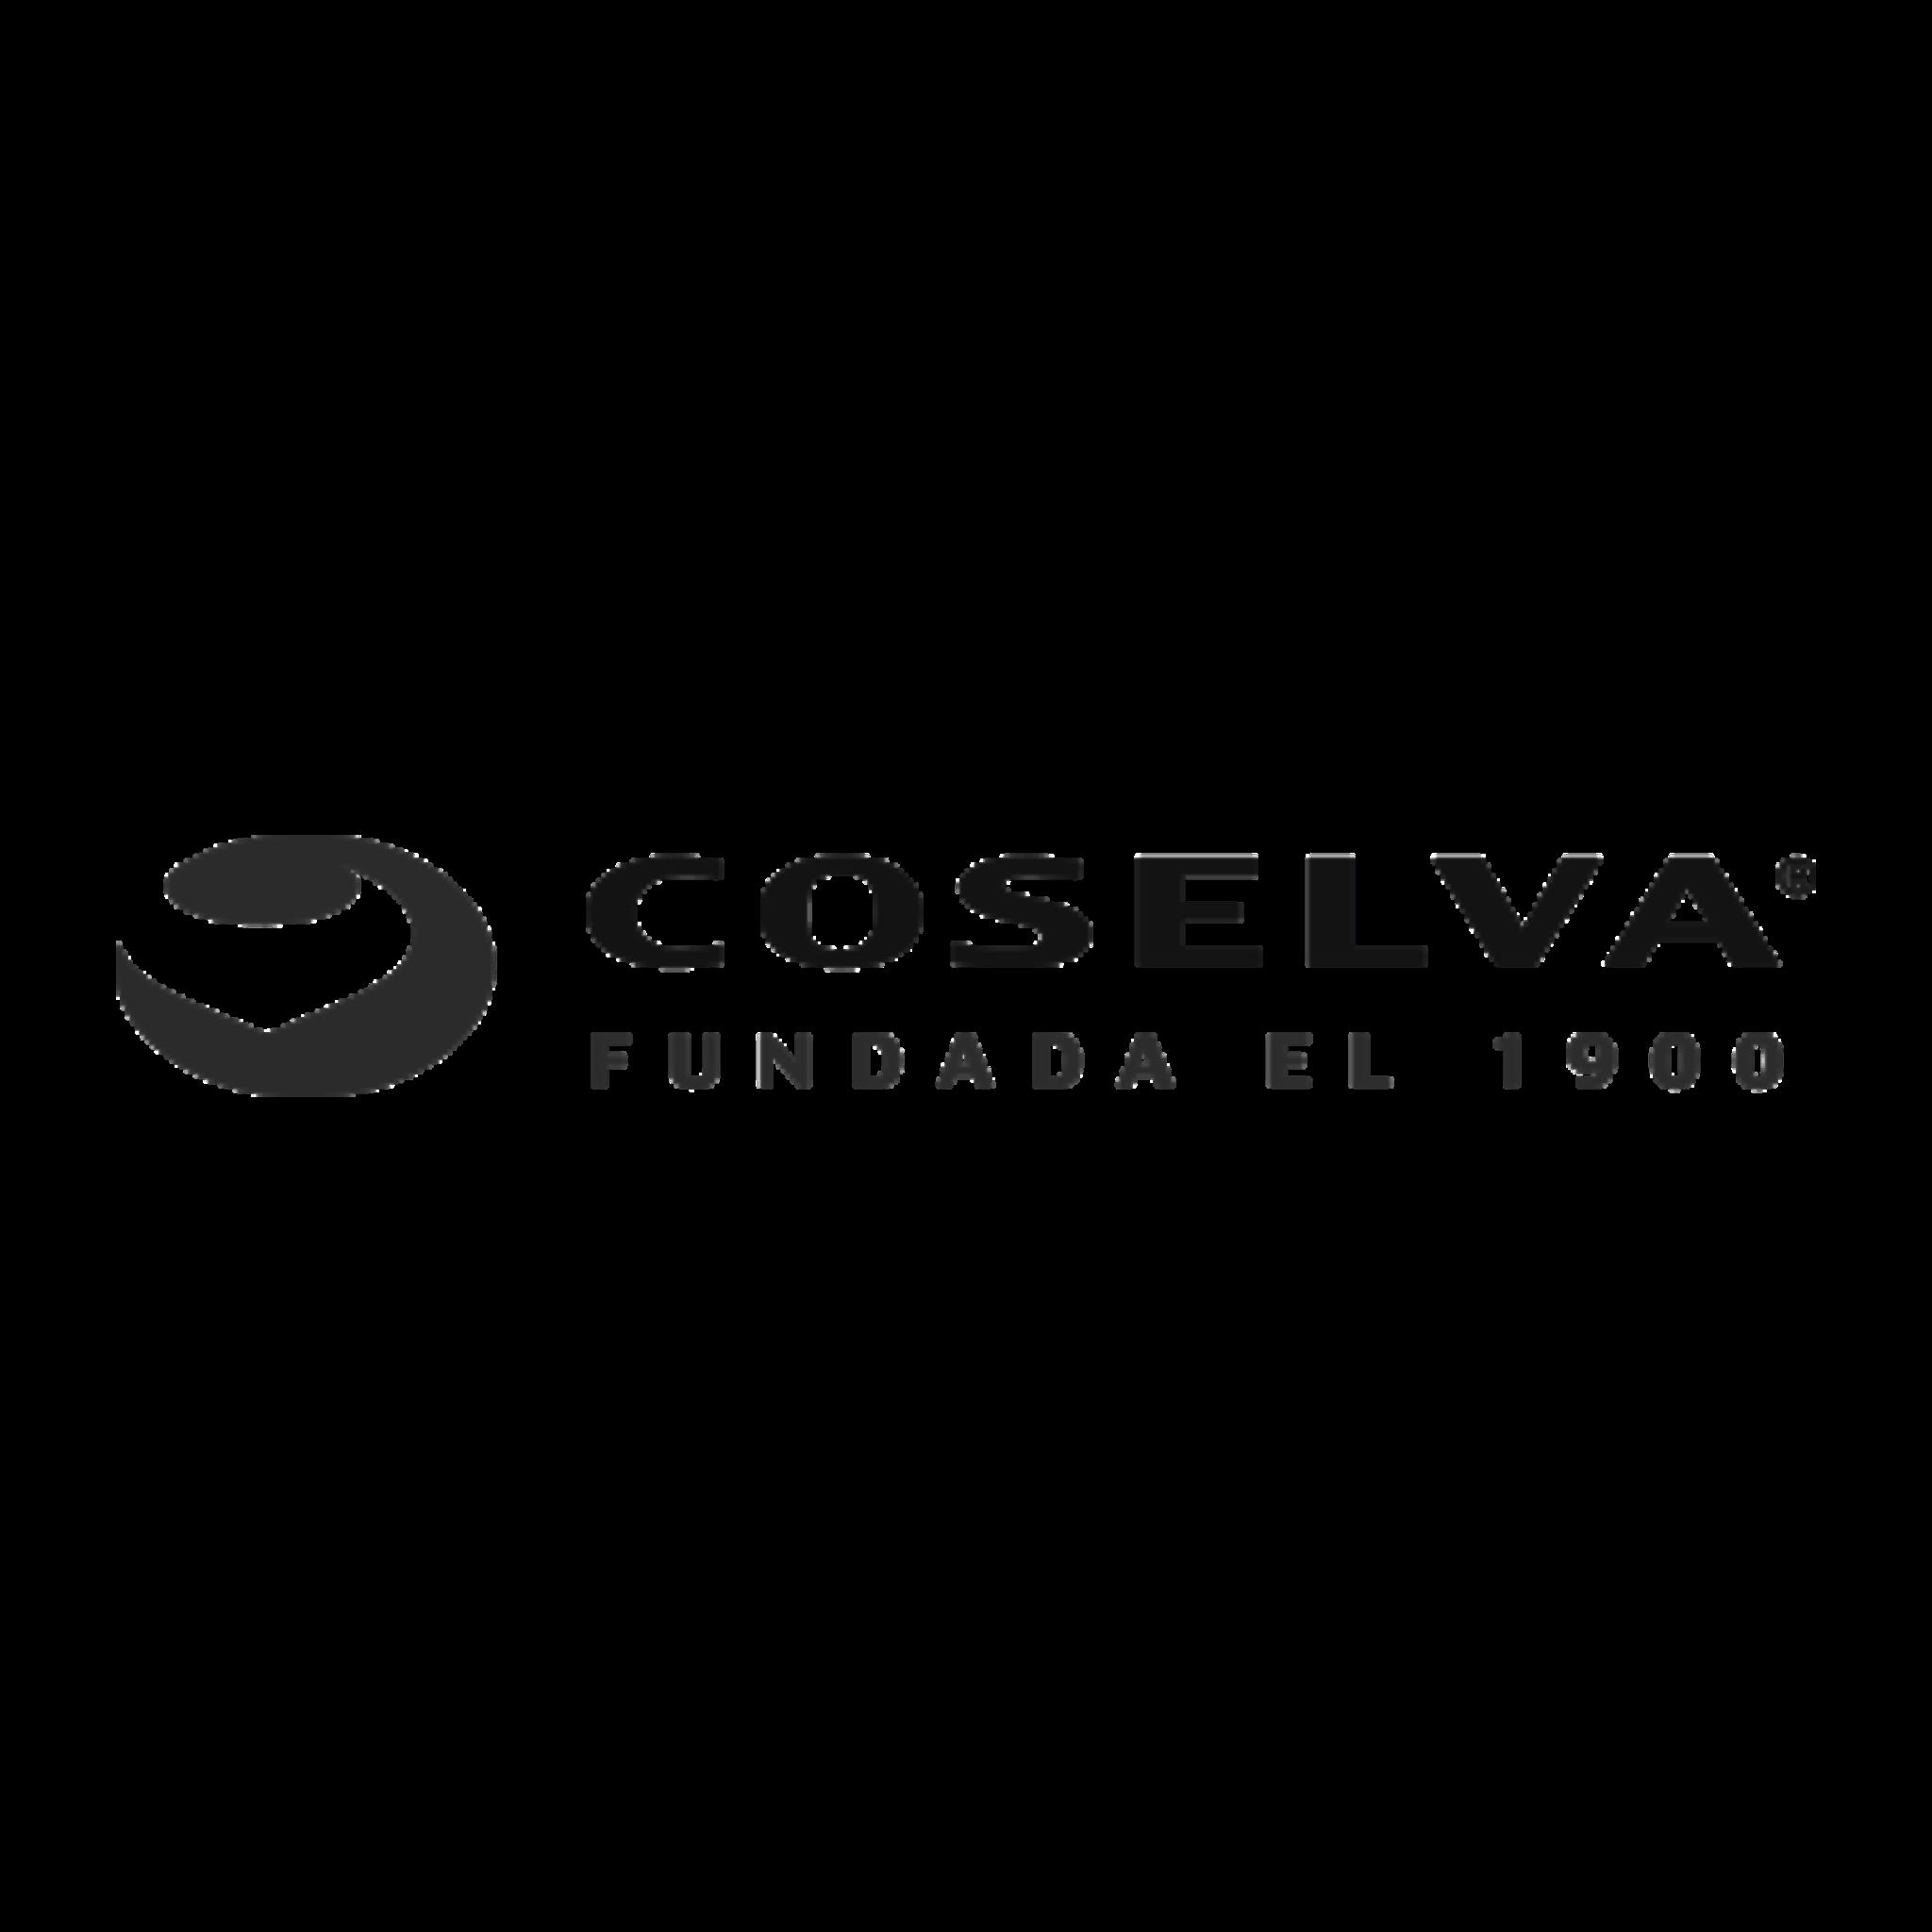 LOGO-Cosalva-1x1-transp